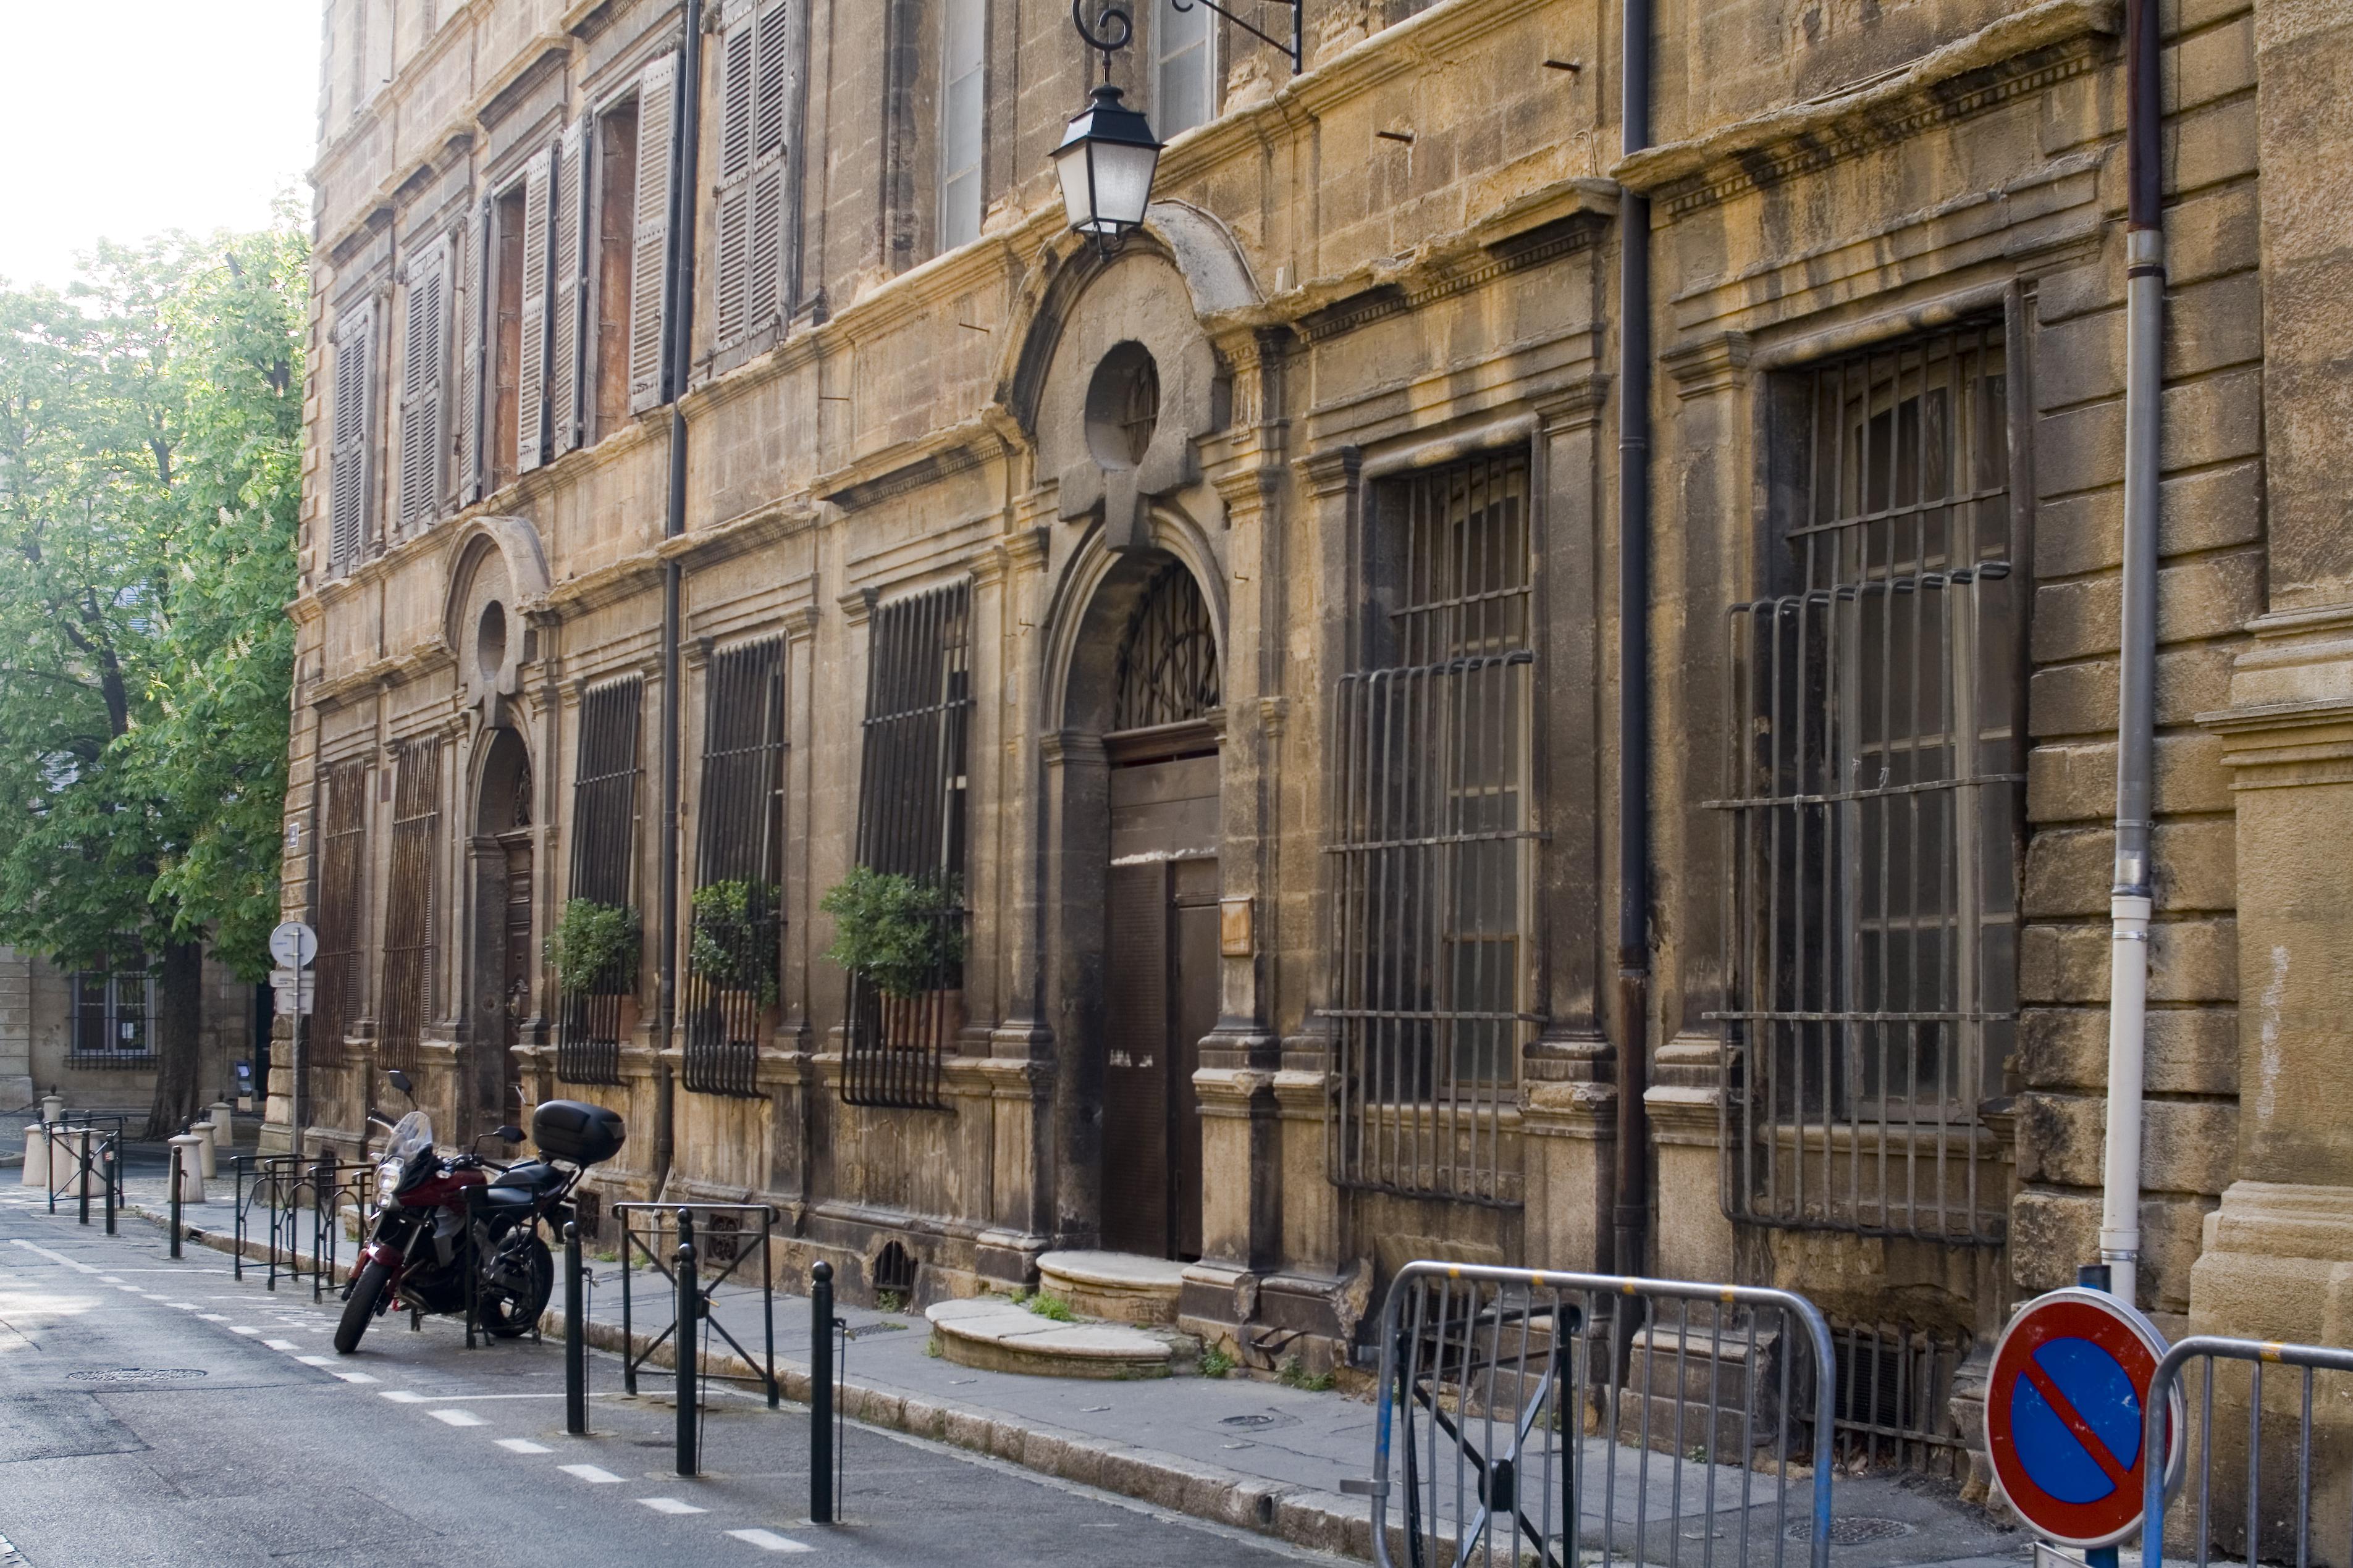 Hotel le cardinal aix en provence for Hotels 2 etoiles aix en provence